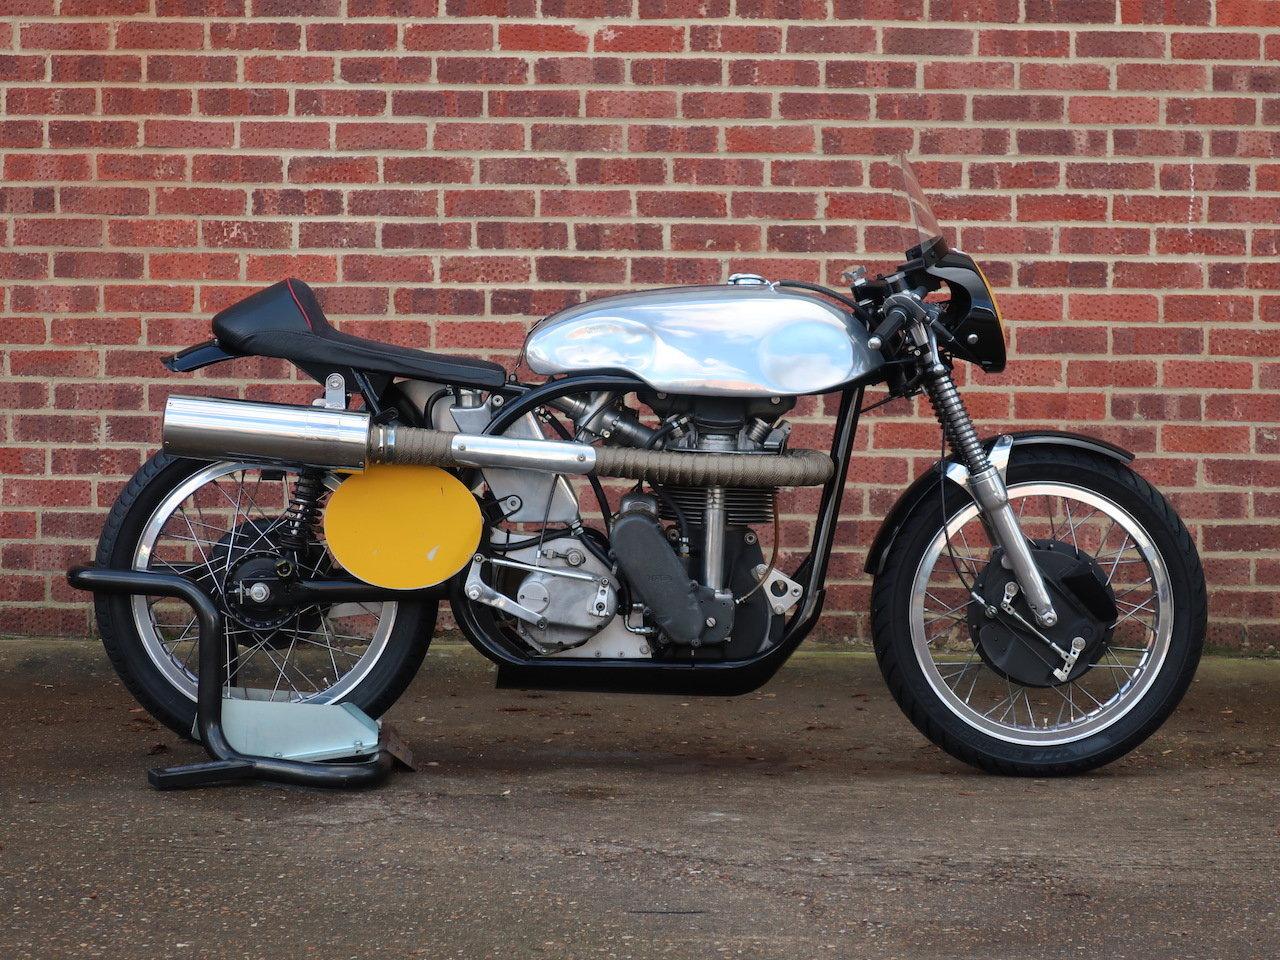 2007 Norton M30 Manx 500cc Race Bike For Sale (picture 1 of 6)